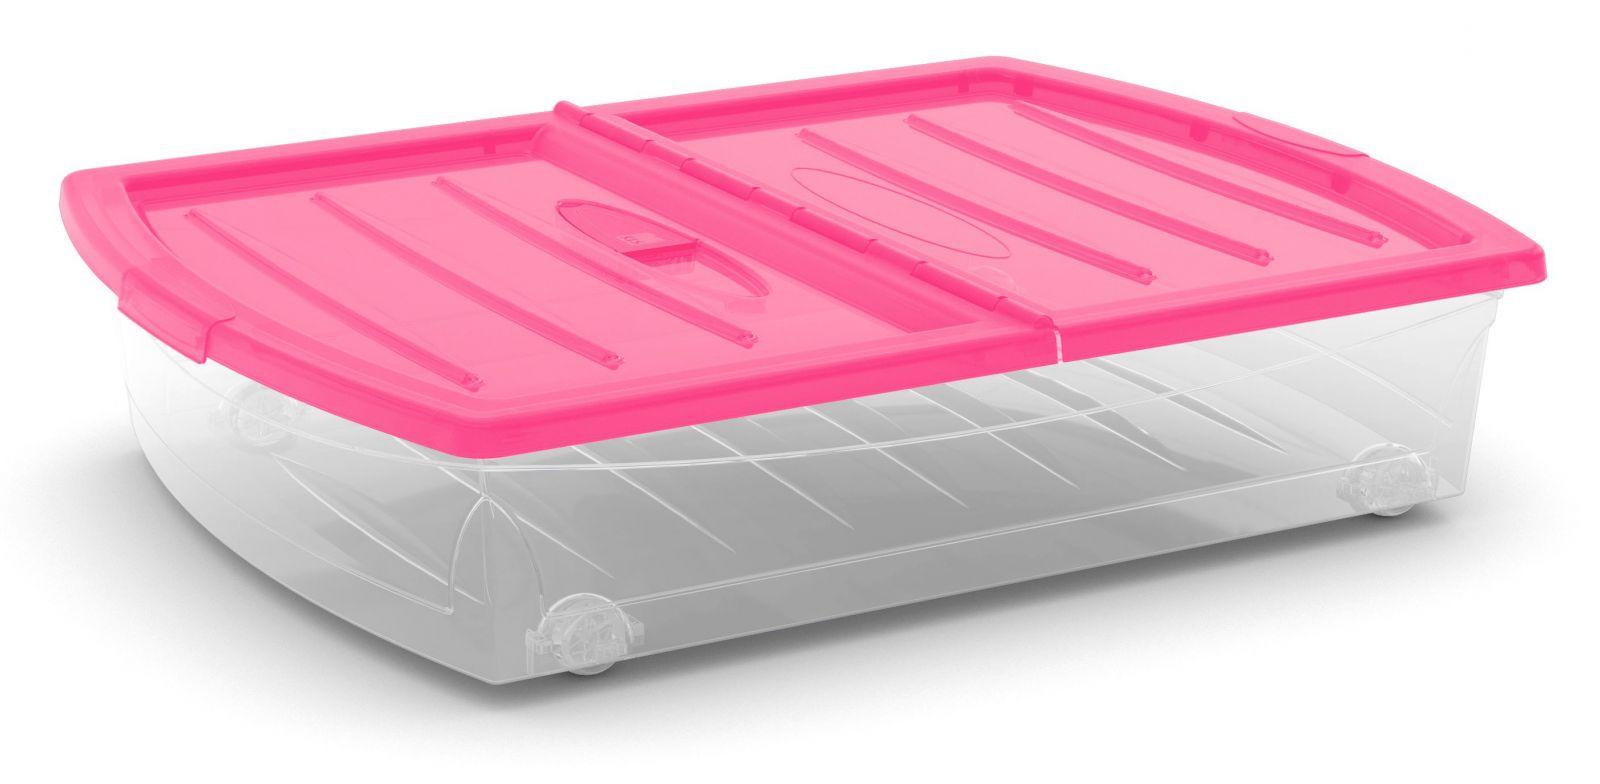 KIS Plastový úložný Spinning Box XL průhledný, Růžové víko, 56 L